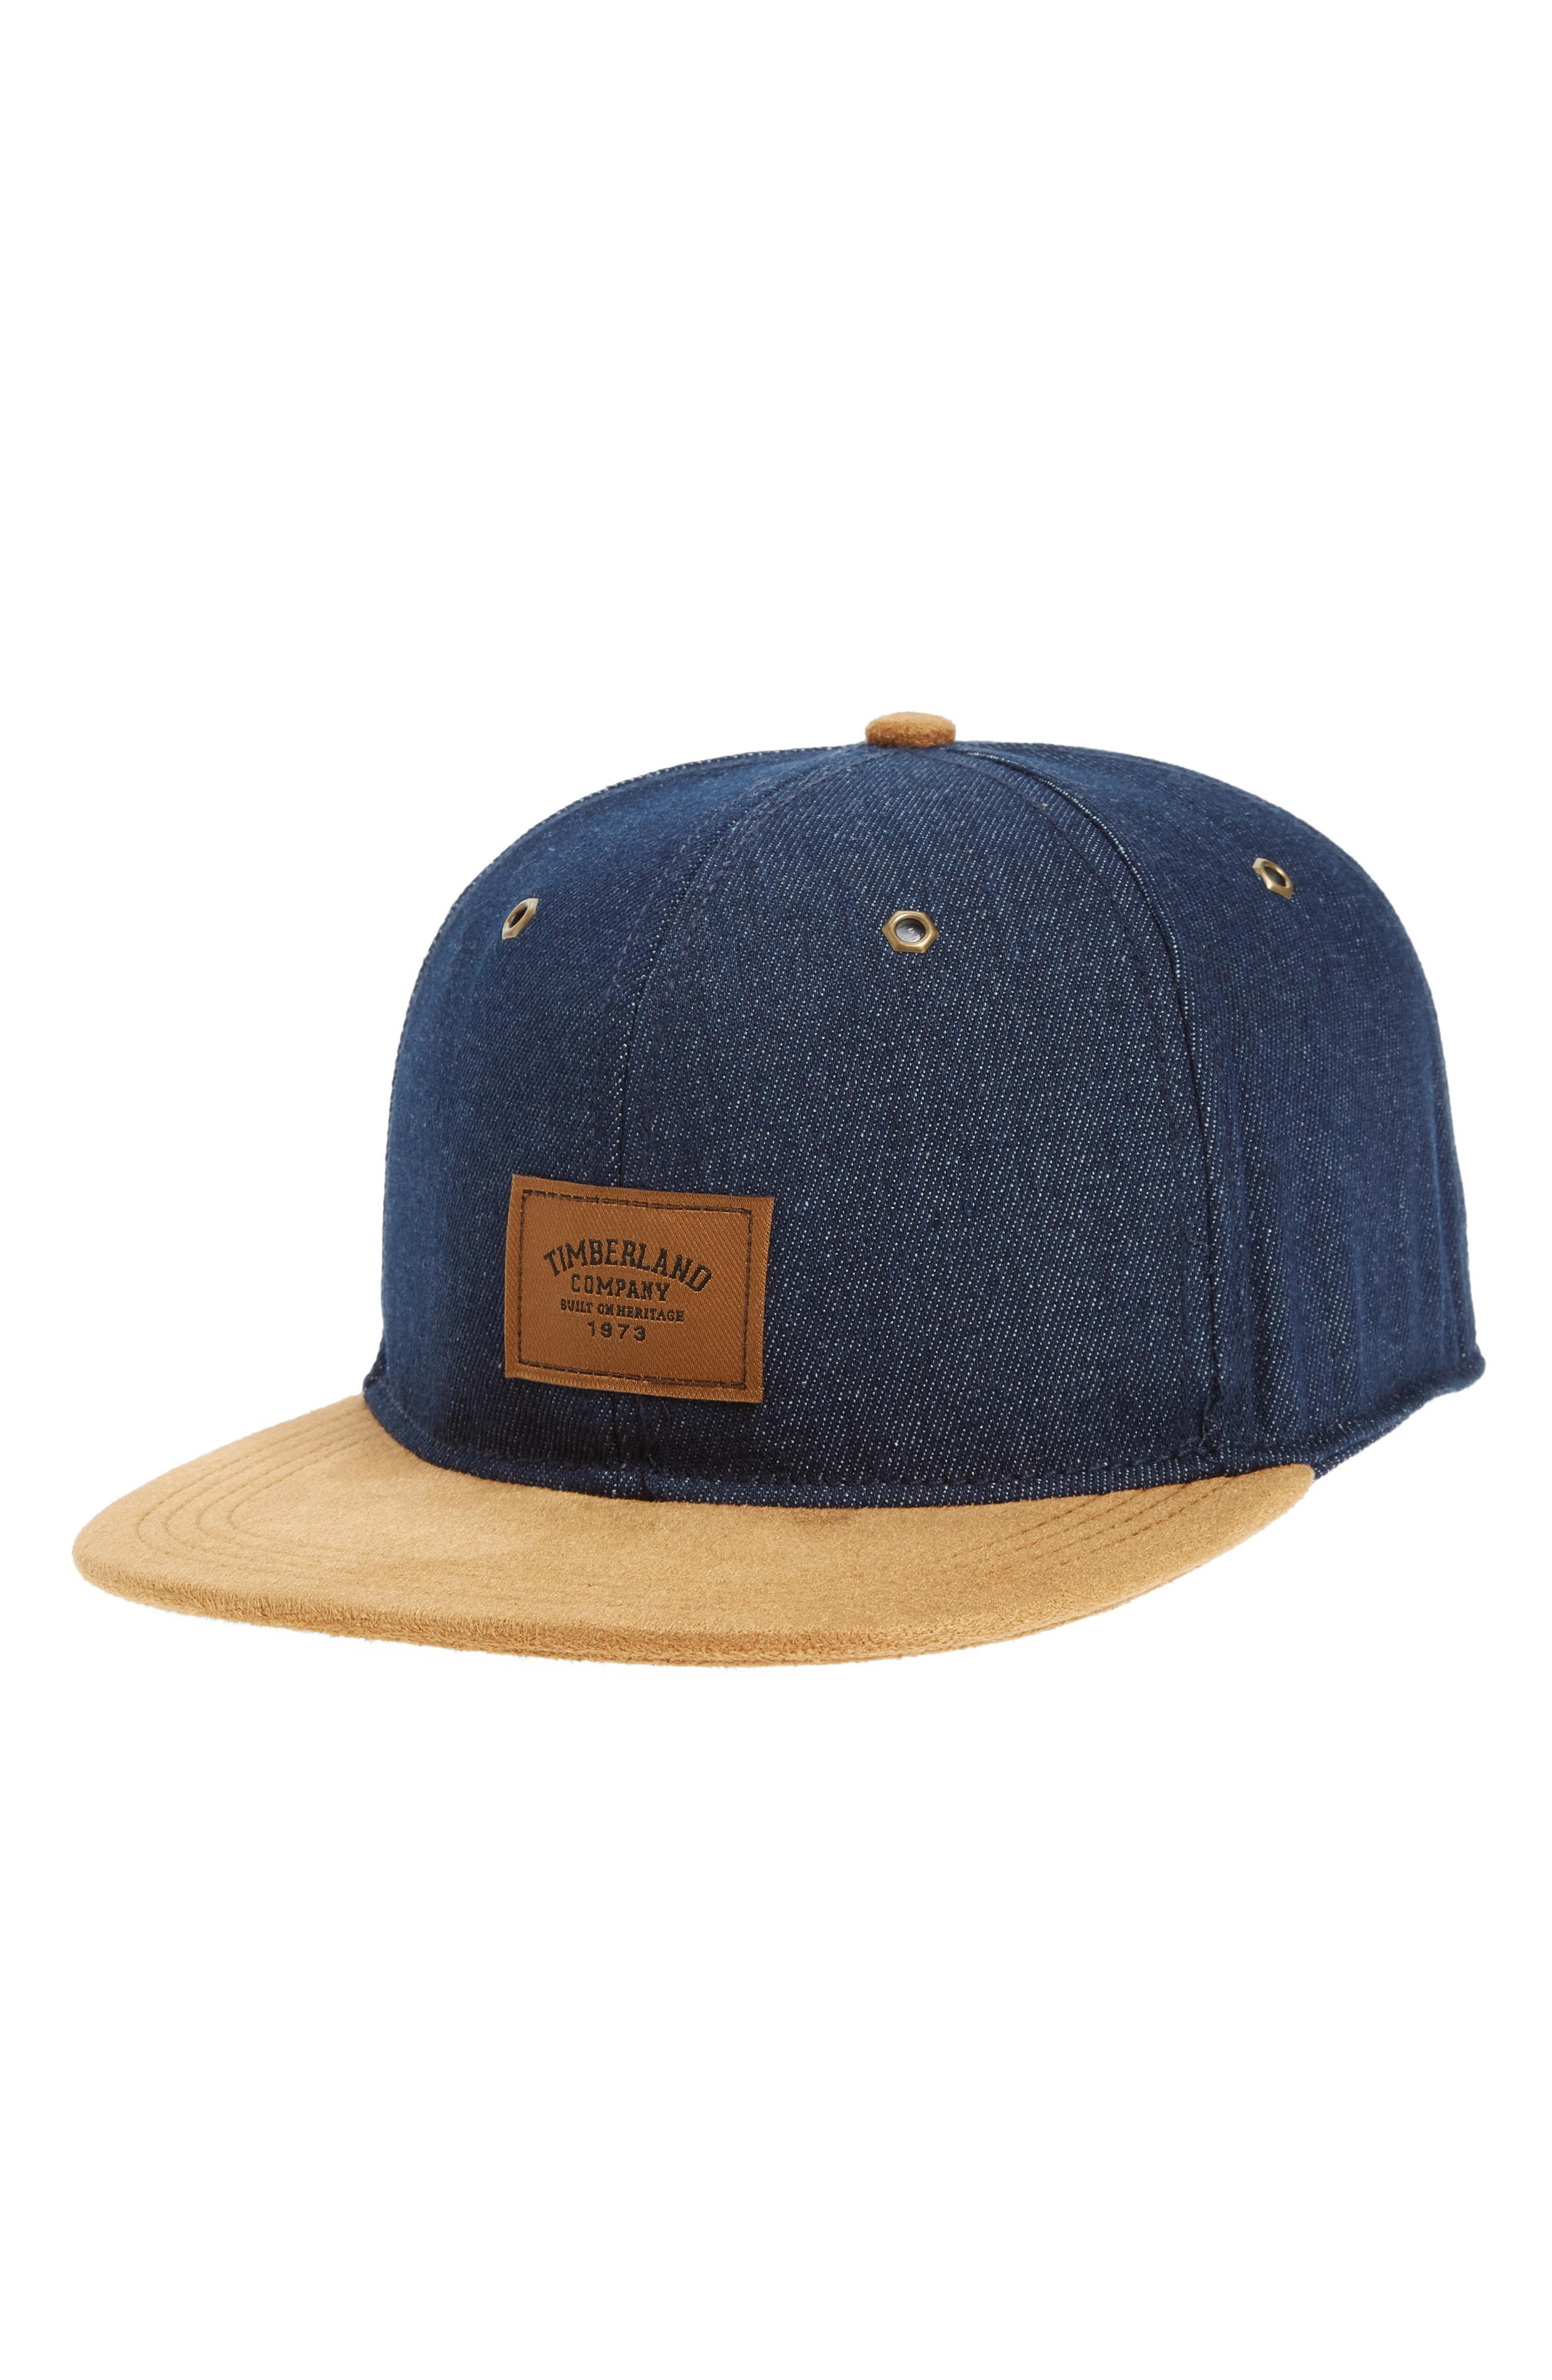 8961664714740 Timberland Tilton Logo Baseball Cap - Blue In Dark Denim